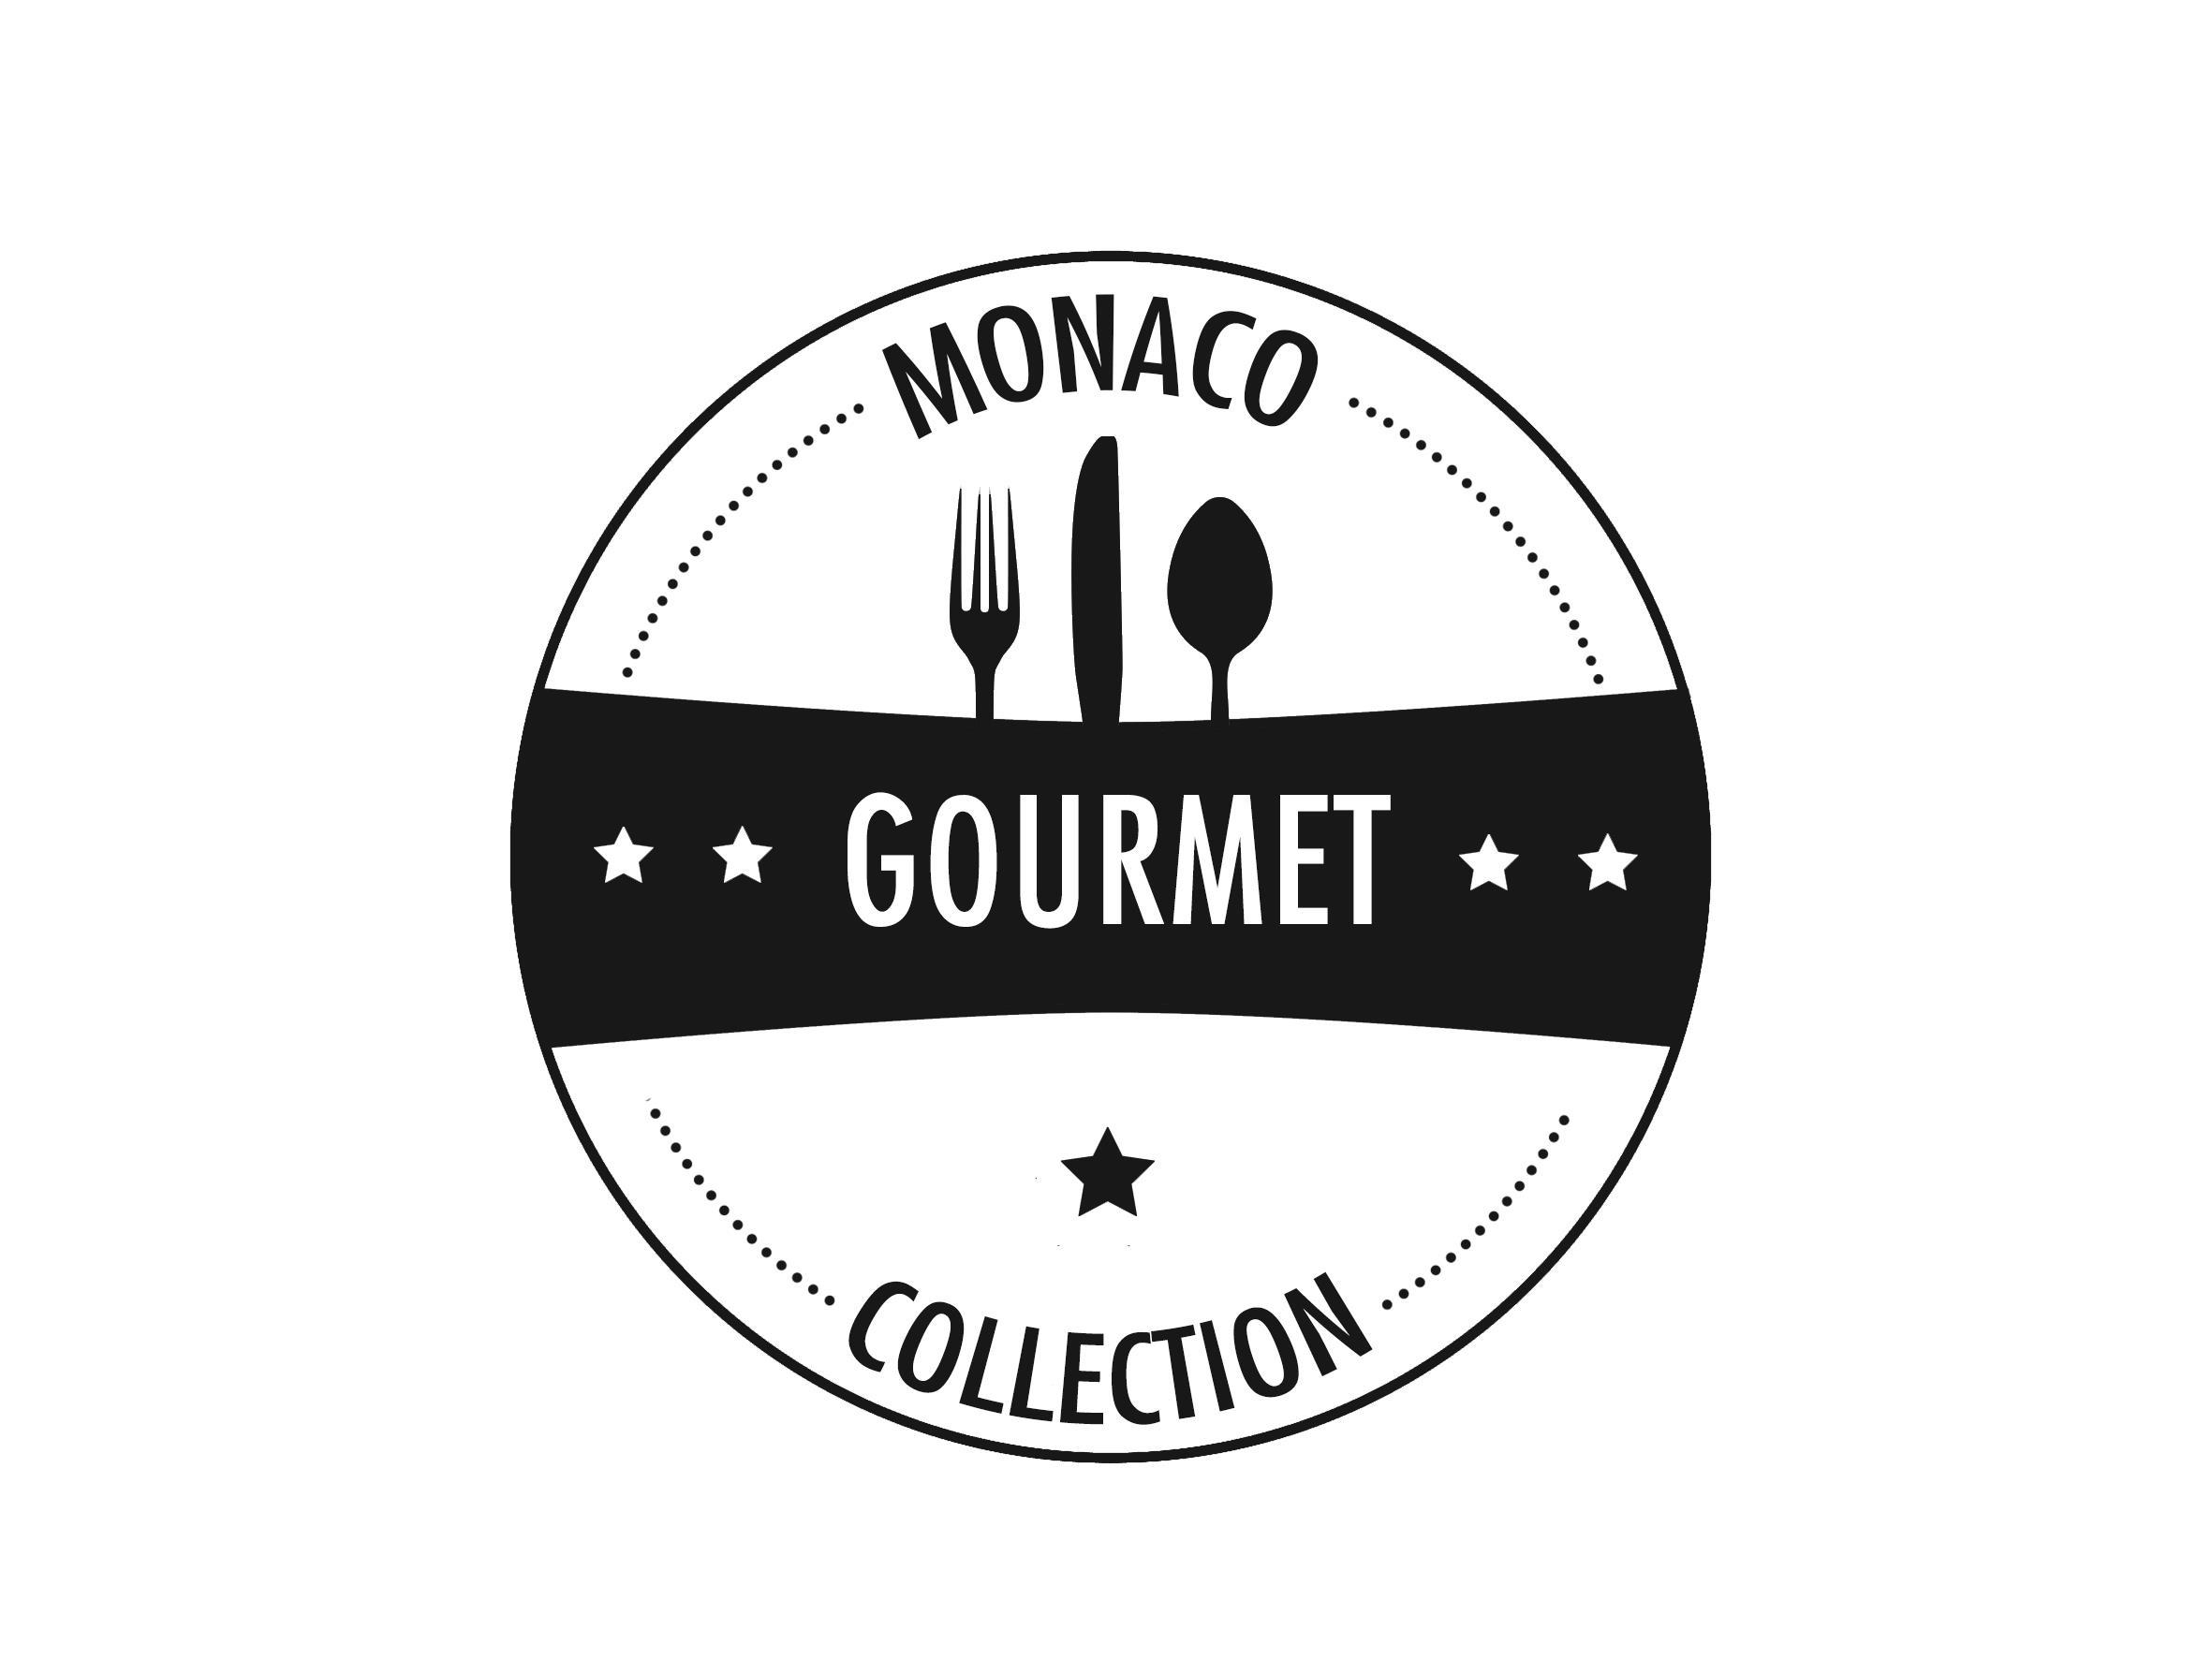 MONACO GOURMET COLLECTION